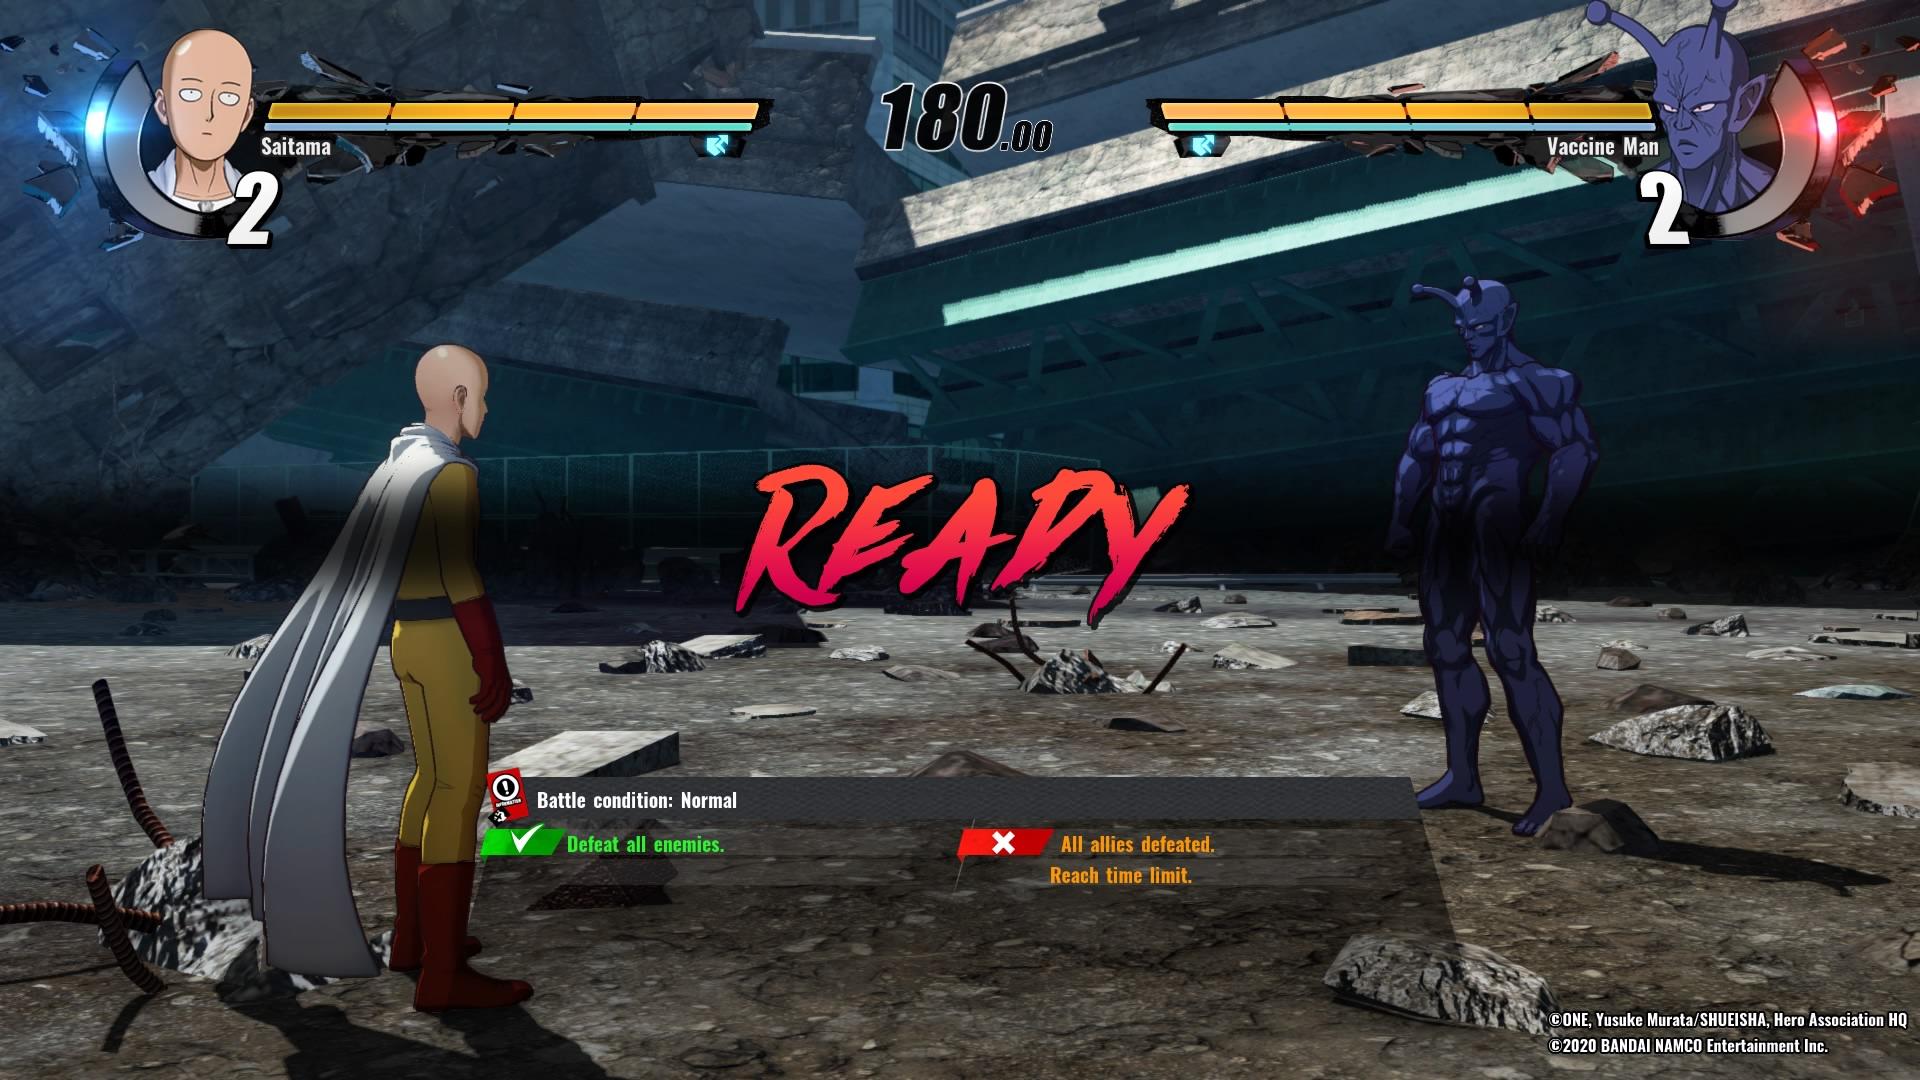 https://gamenews.es/wp-content/uploads/2020/11/1606043433_429_Revision-One-Punch-Man-un-heroe-que-nadie-conoce.jpg